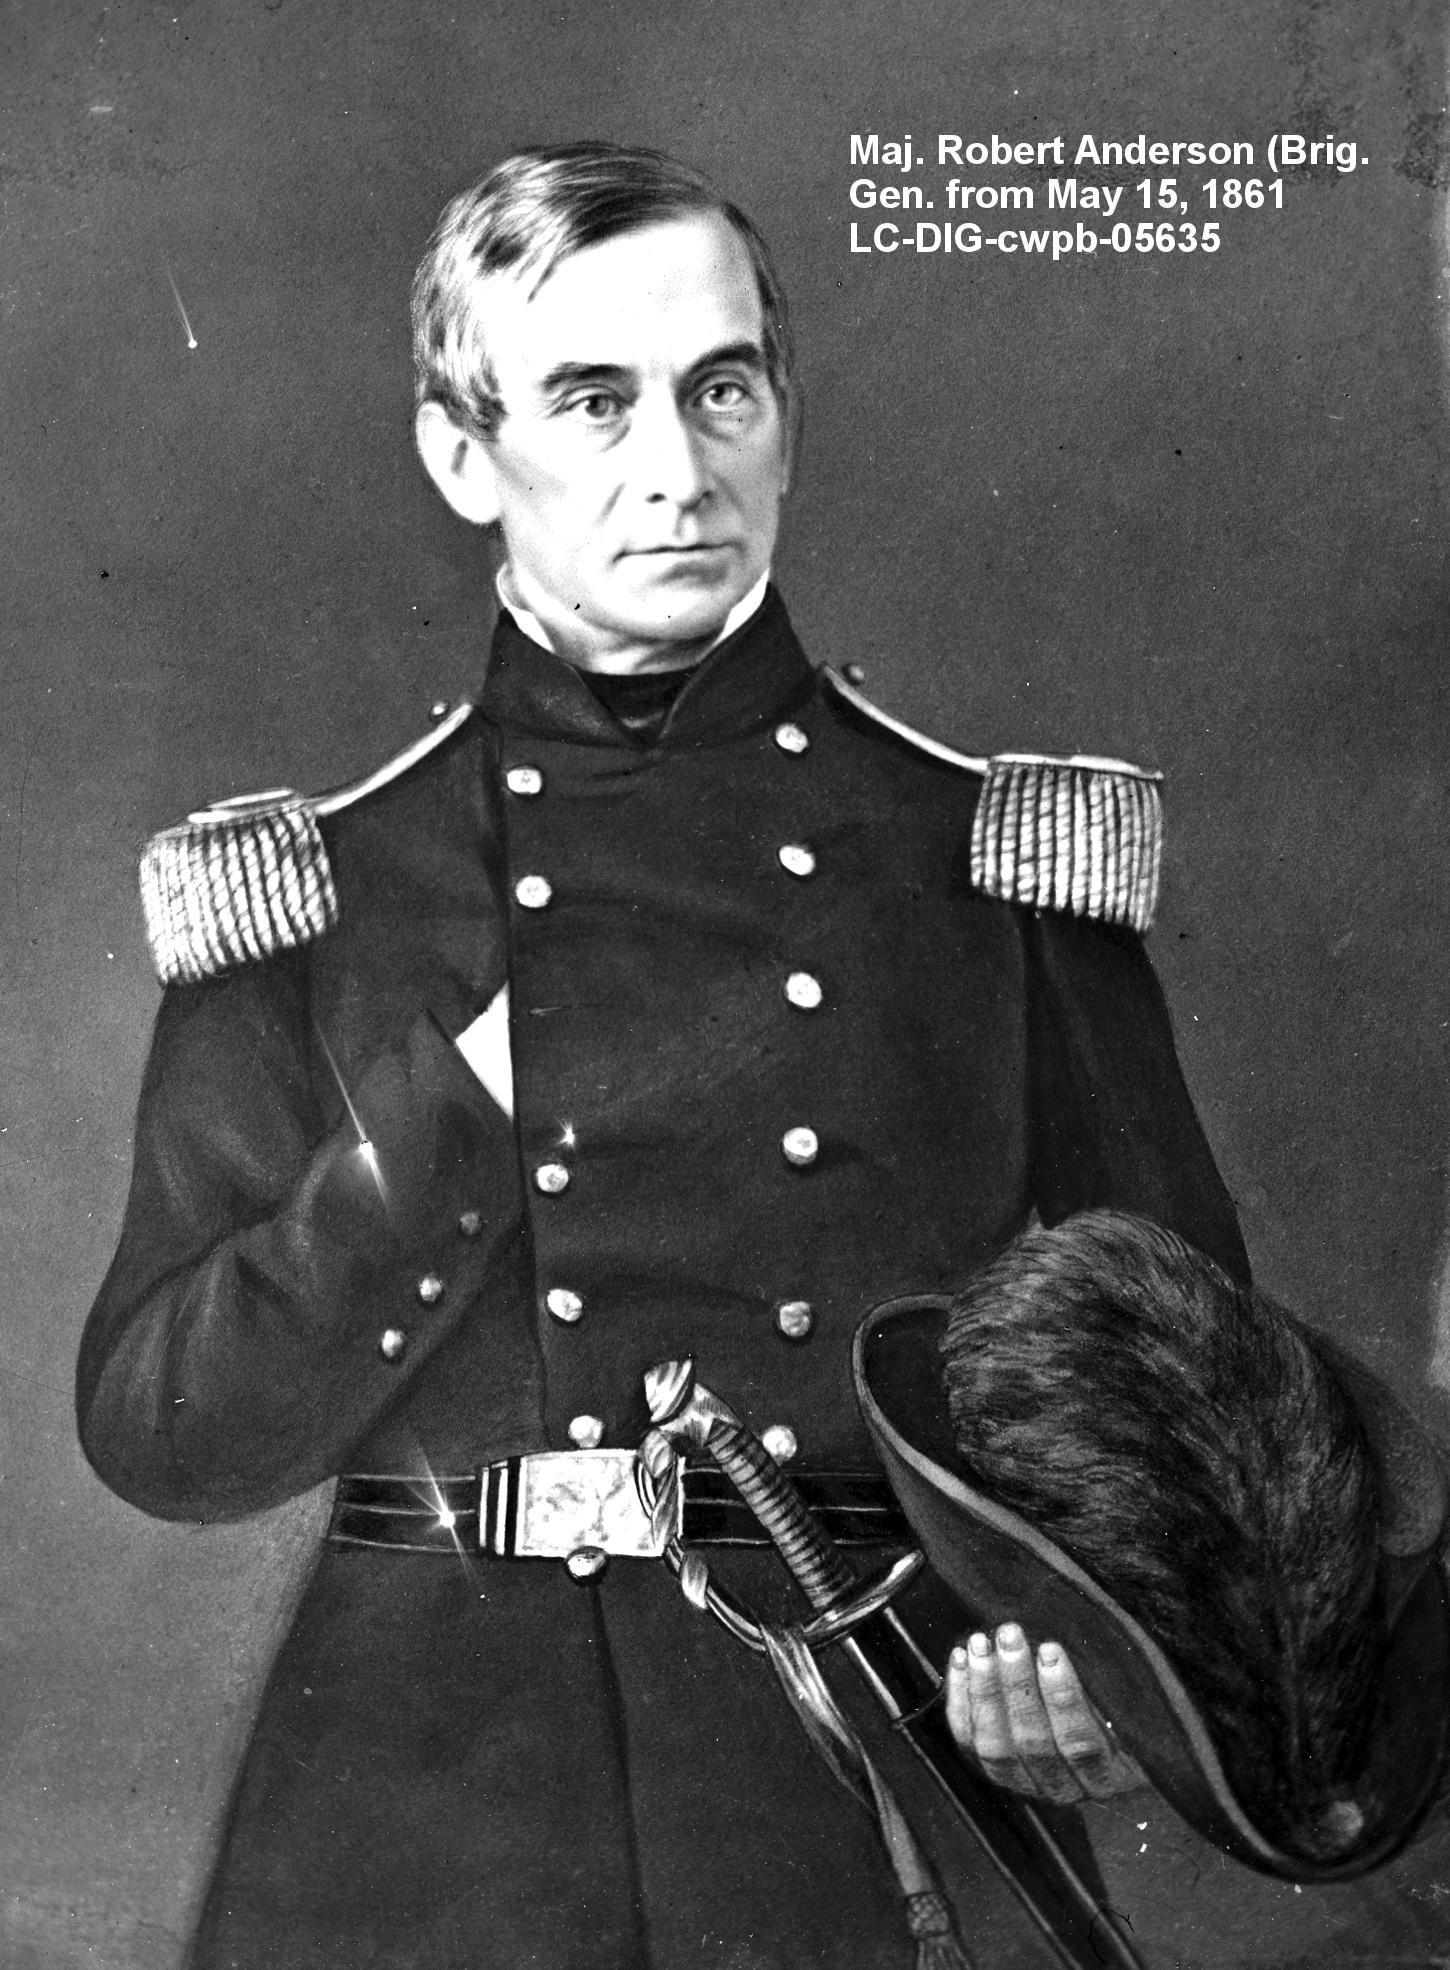 December 26, 1860, Major Robert Anderson transfers his ...